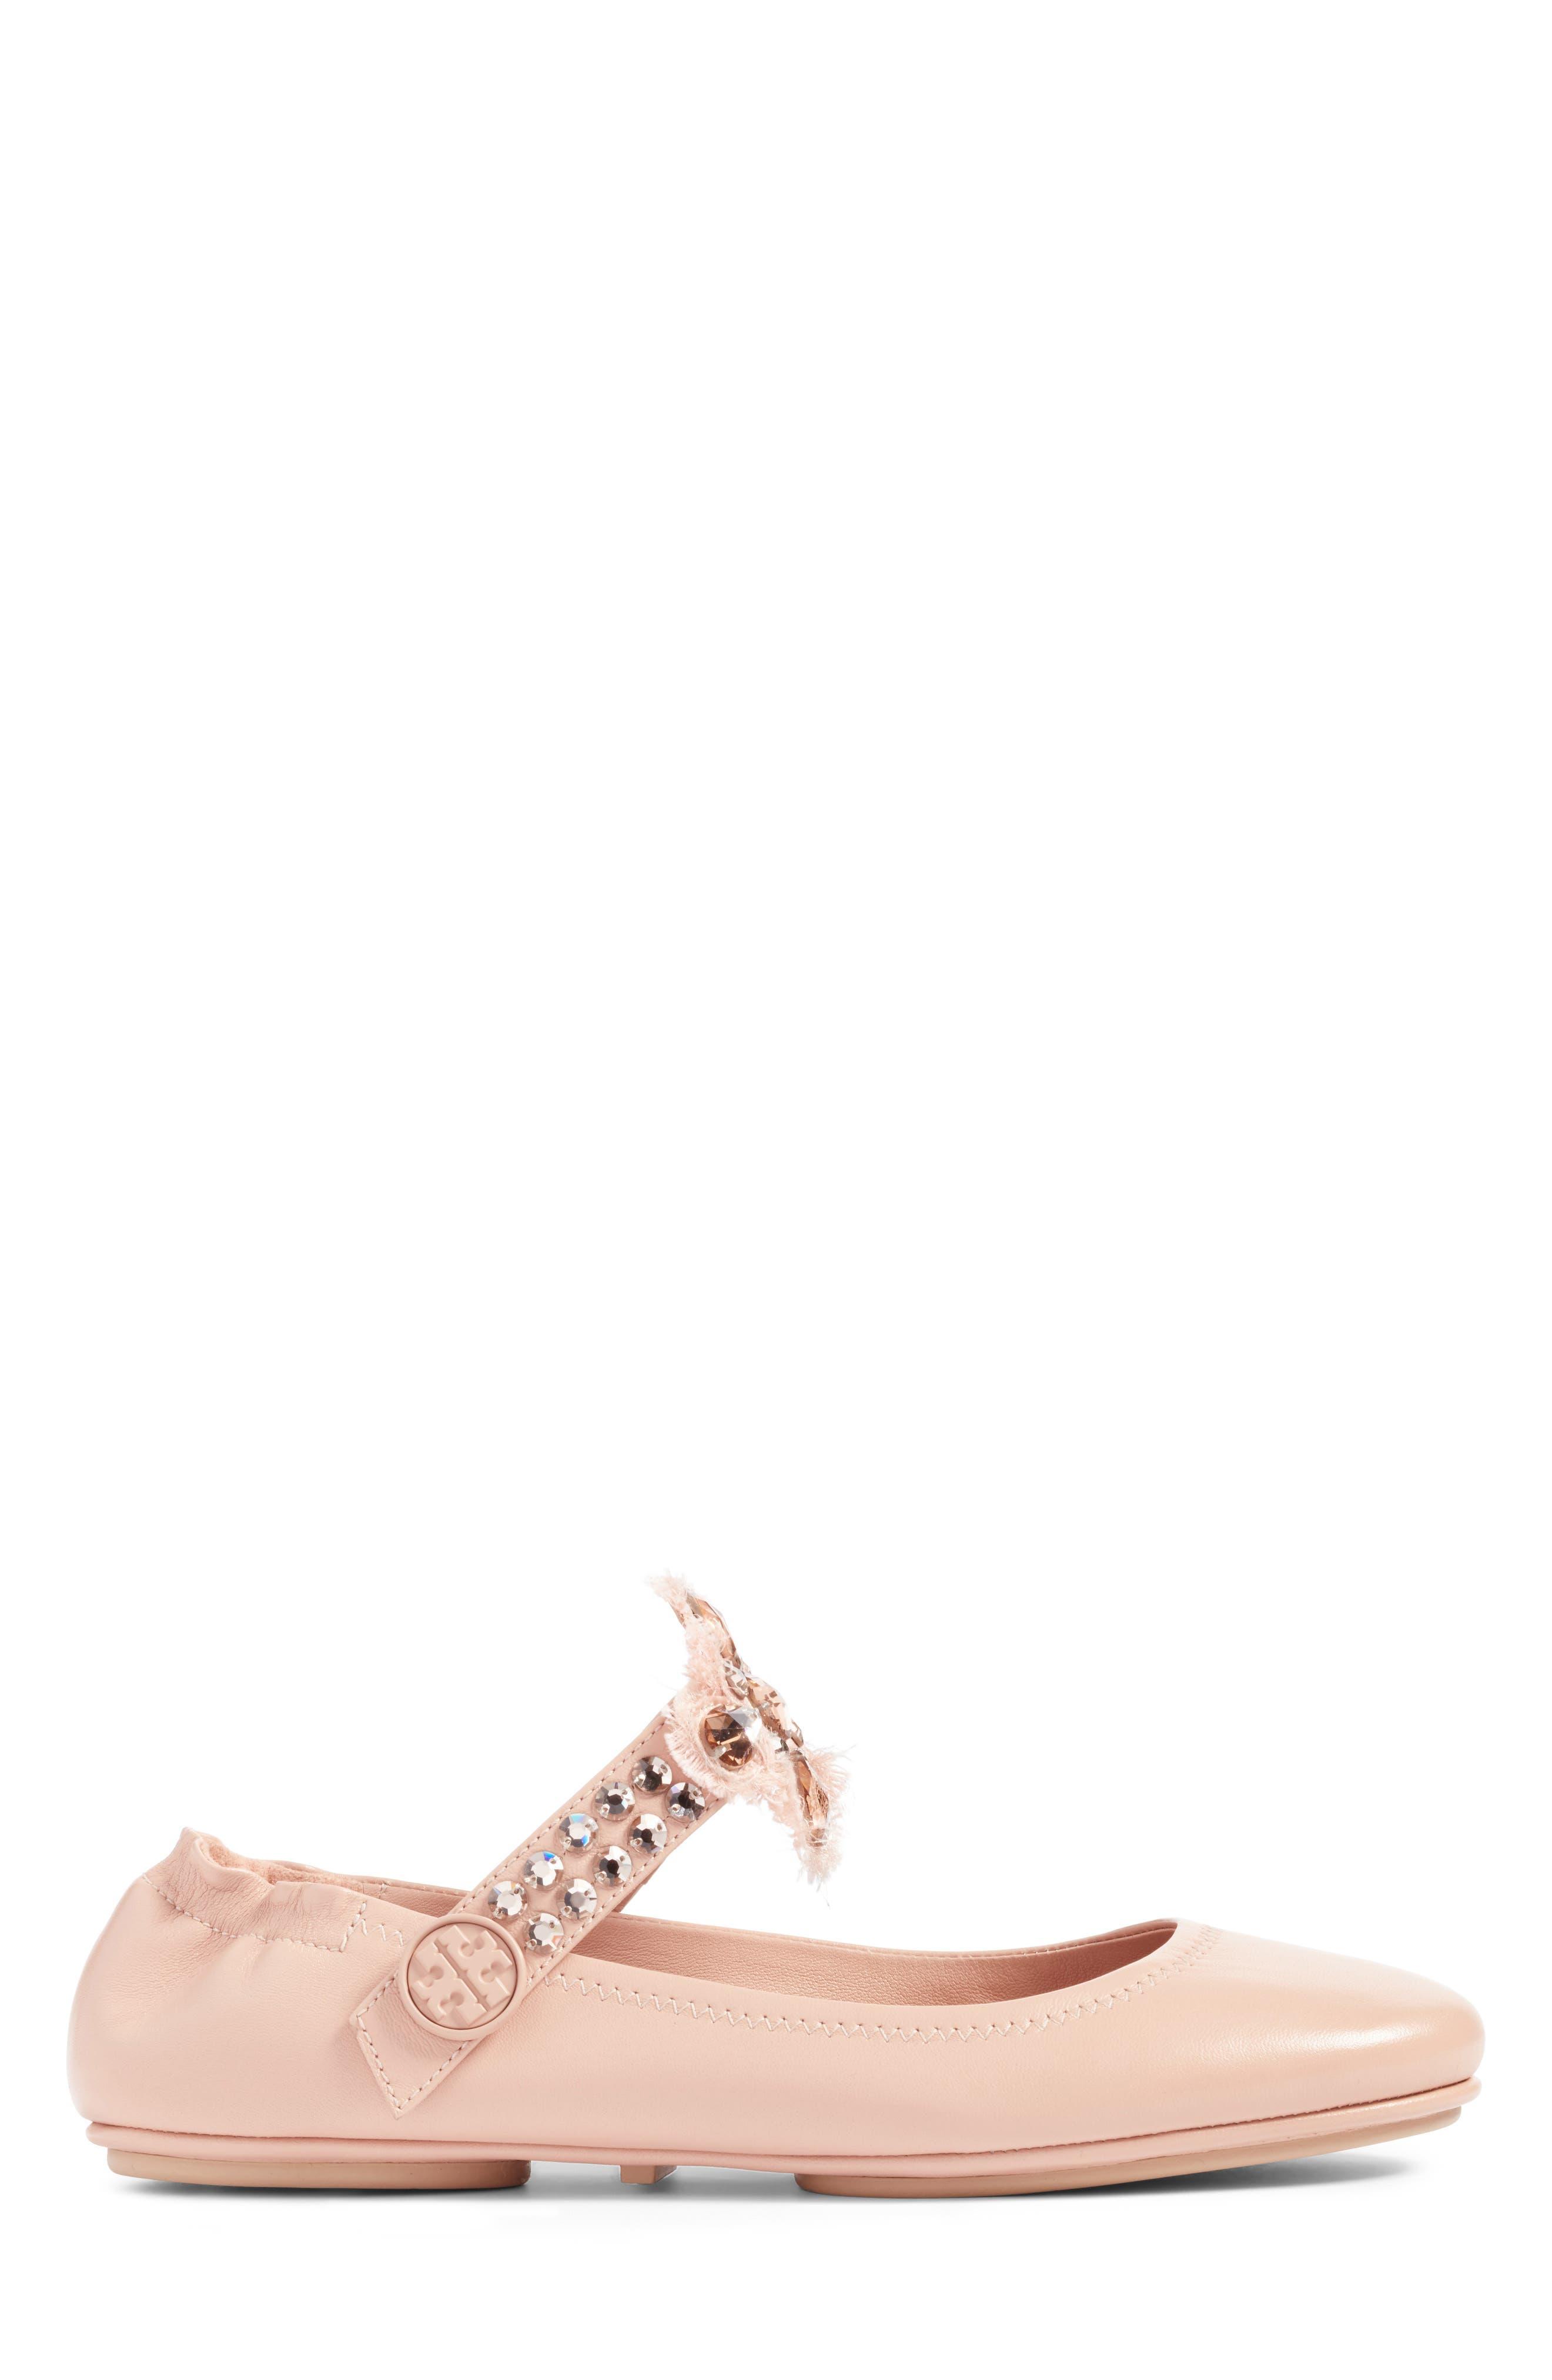 Alternate Image 3  - Tory Burch Minnie Embellished Convertible Strap Ballet Flat (Women)